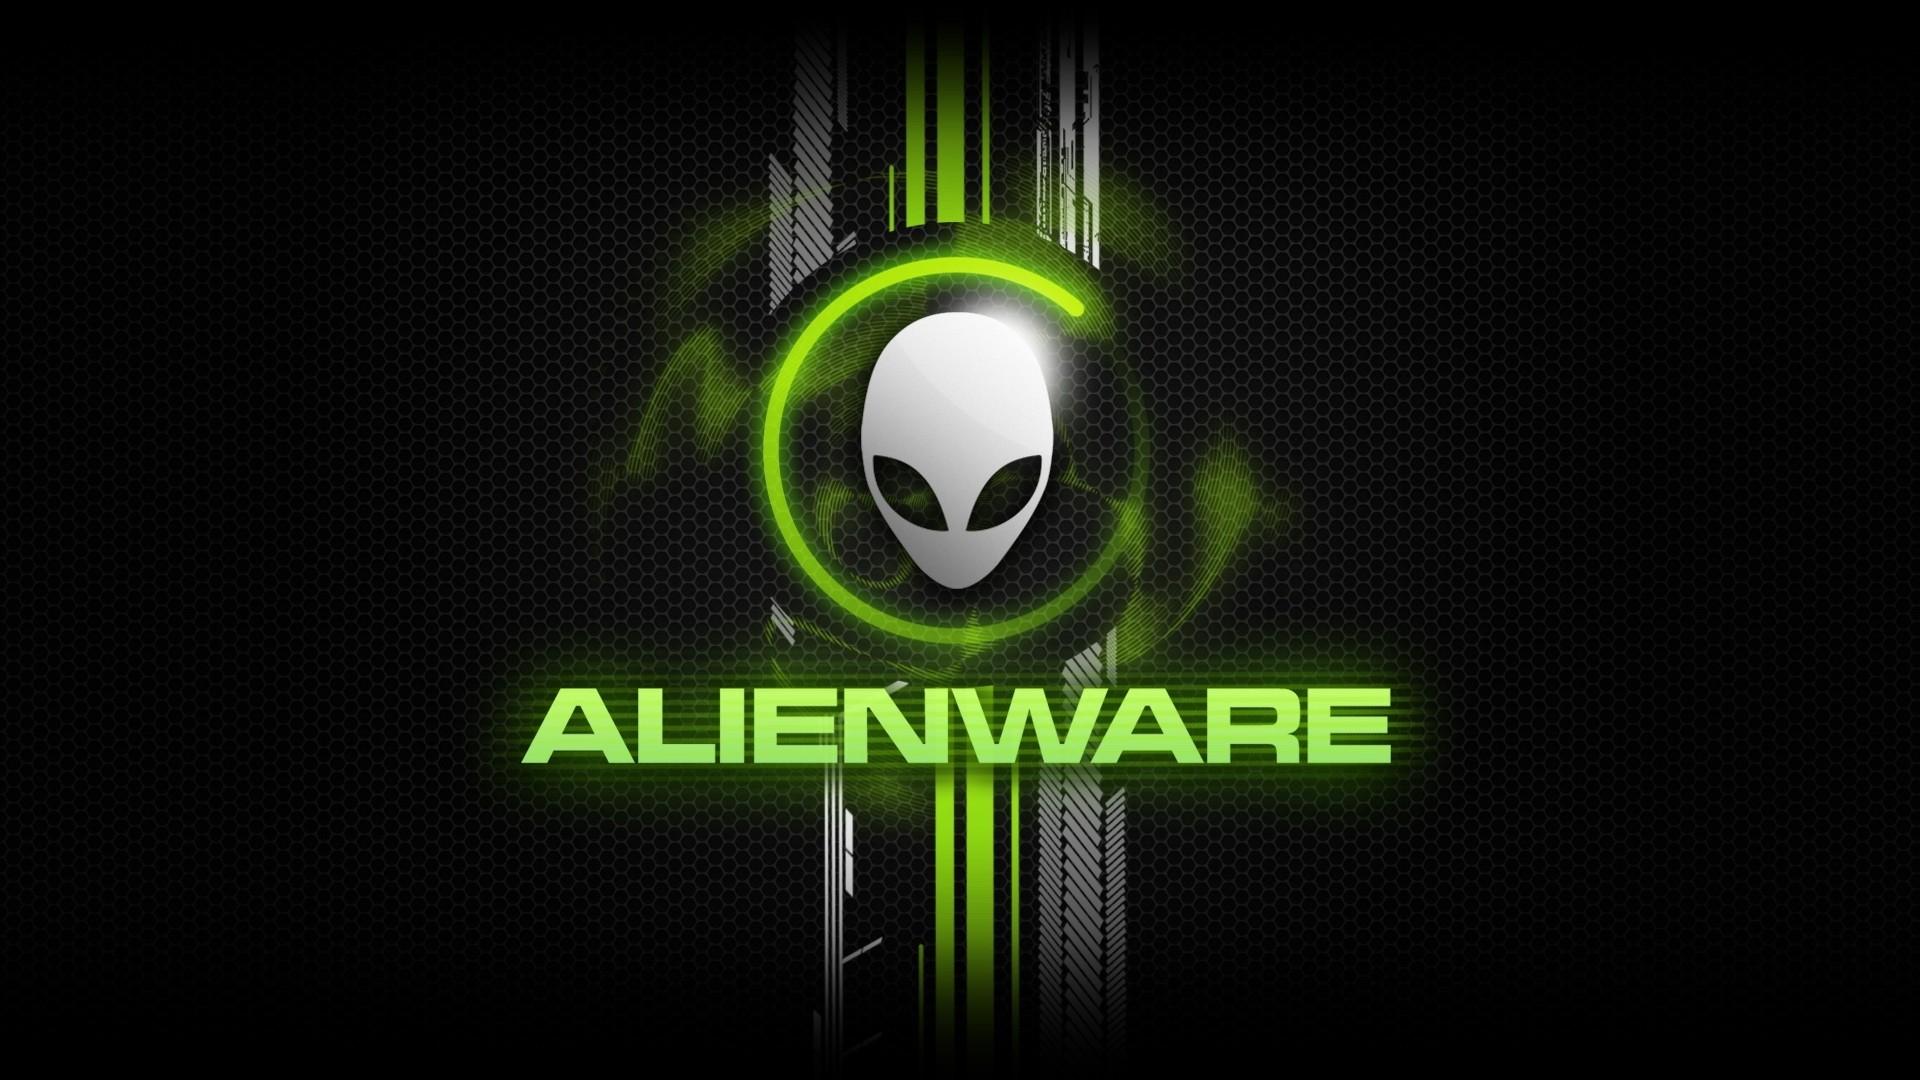 Technology Alienware Wallpaper 1920x1080 Technology Alienware 1920x1080